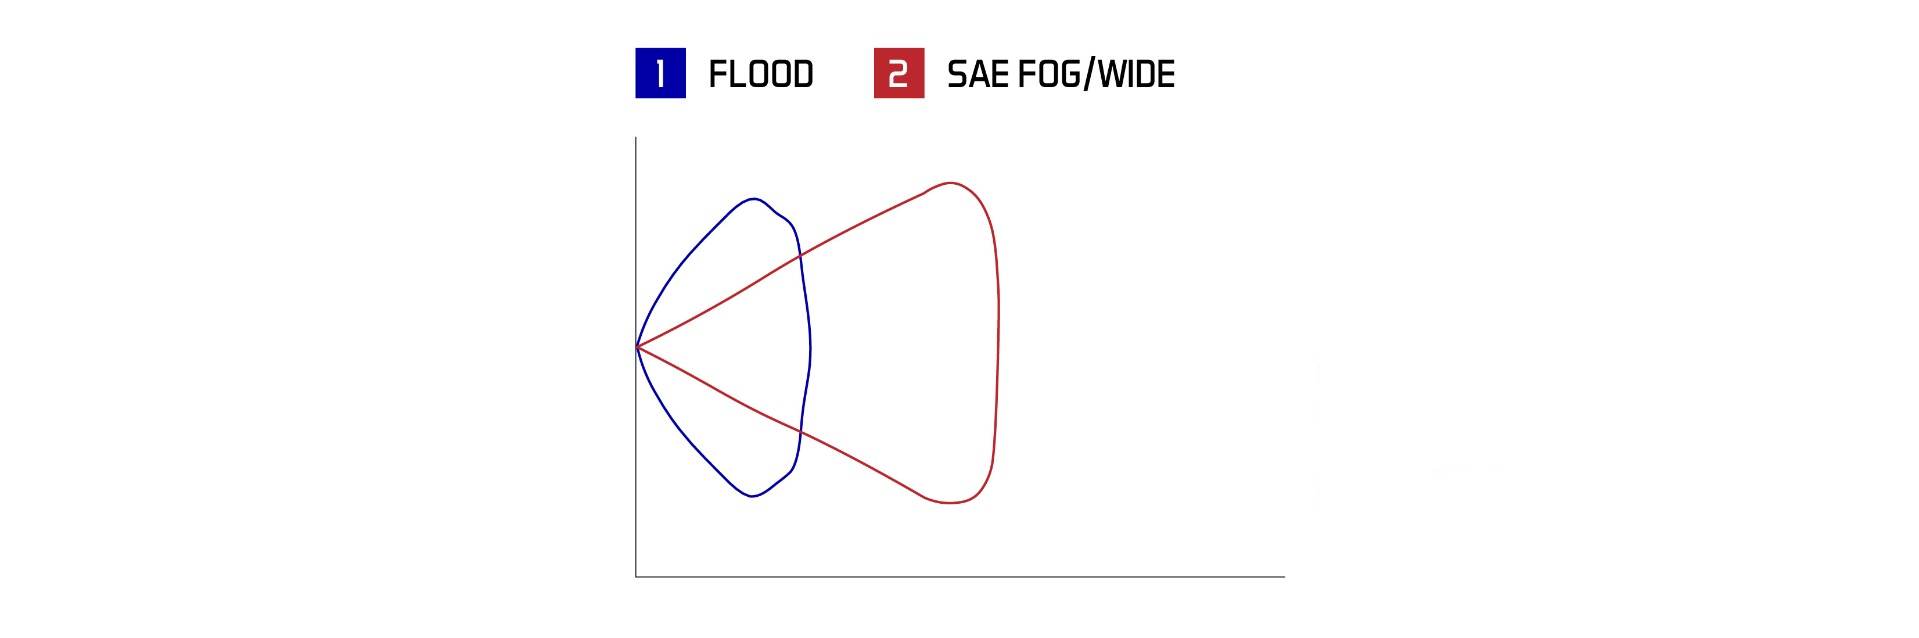 Stage Series C2 Flush Mount Beam Patterns